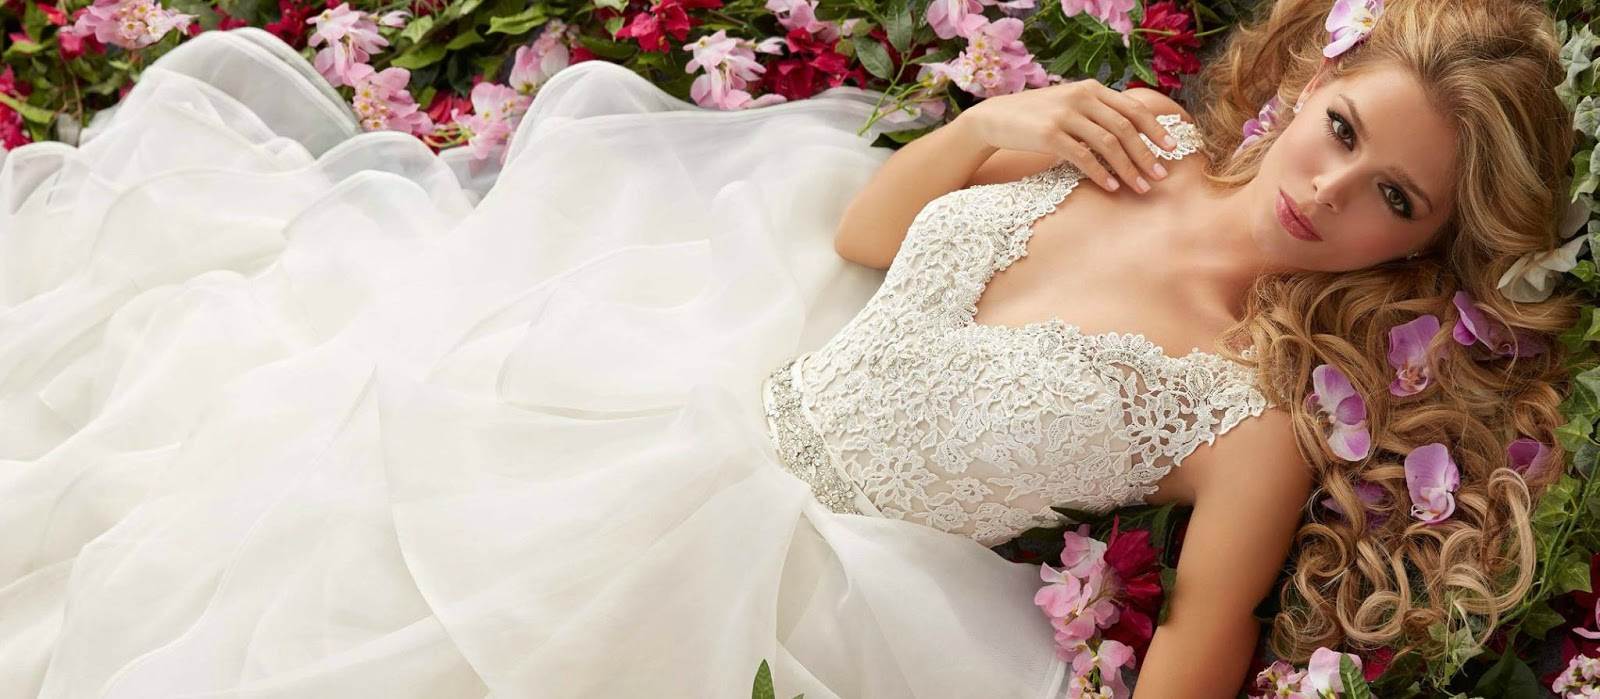 Wedding dresses miami vosoi buy wedding dresses in miami u2013 your wedding memories photo ombrellifo Images